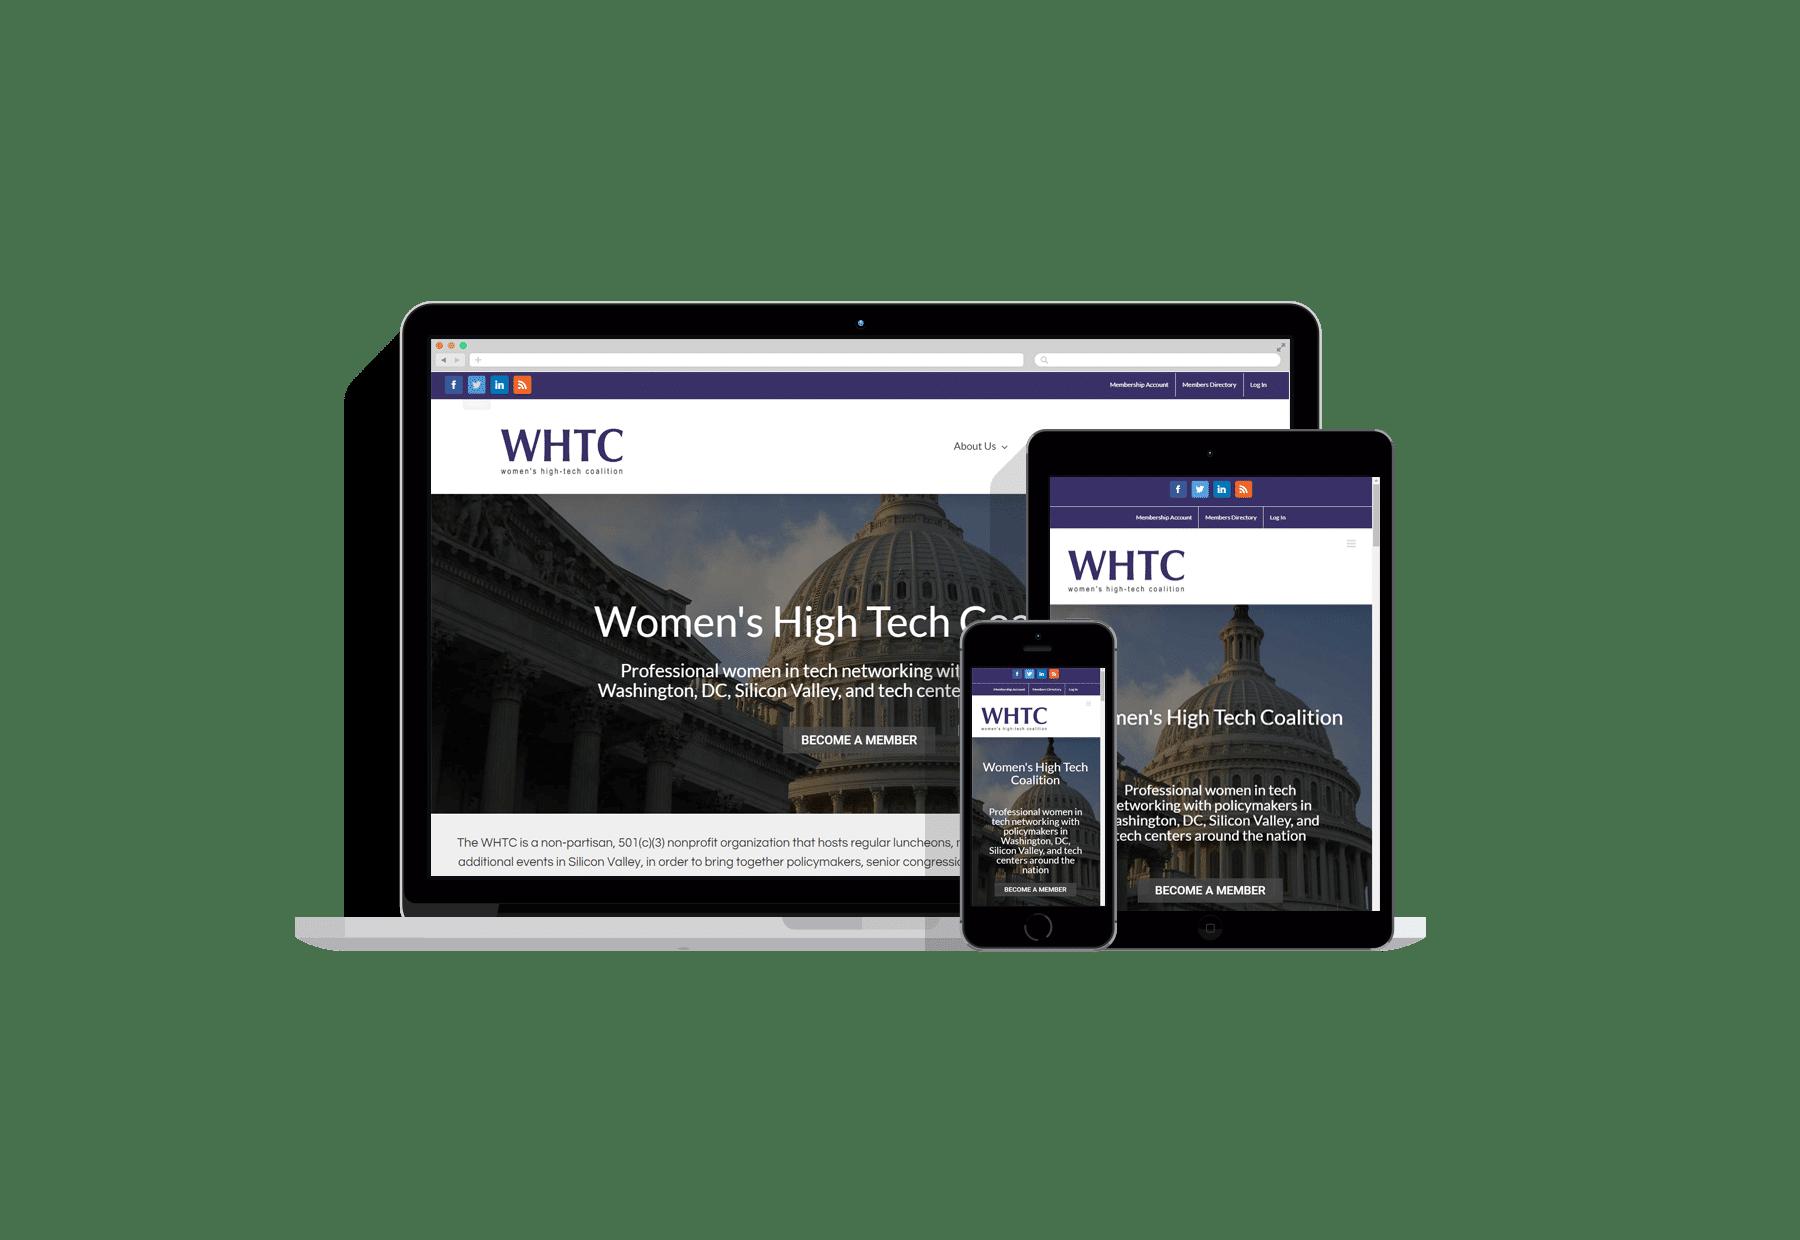 Women's High Tech Coalition